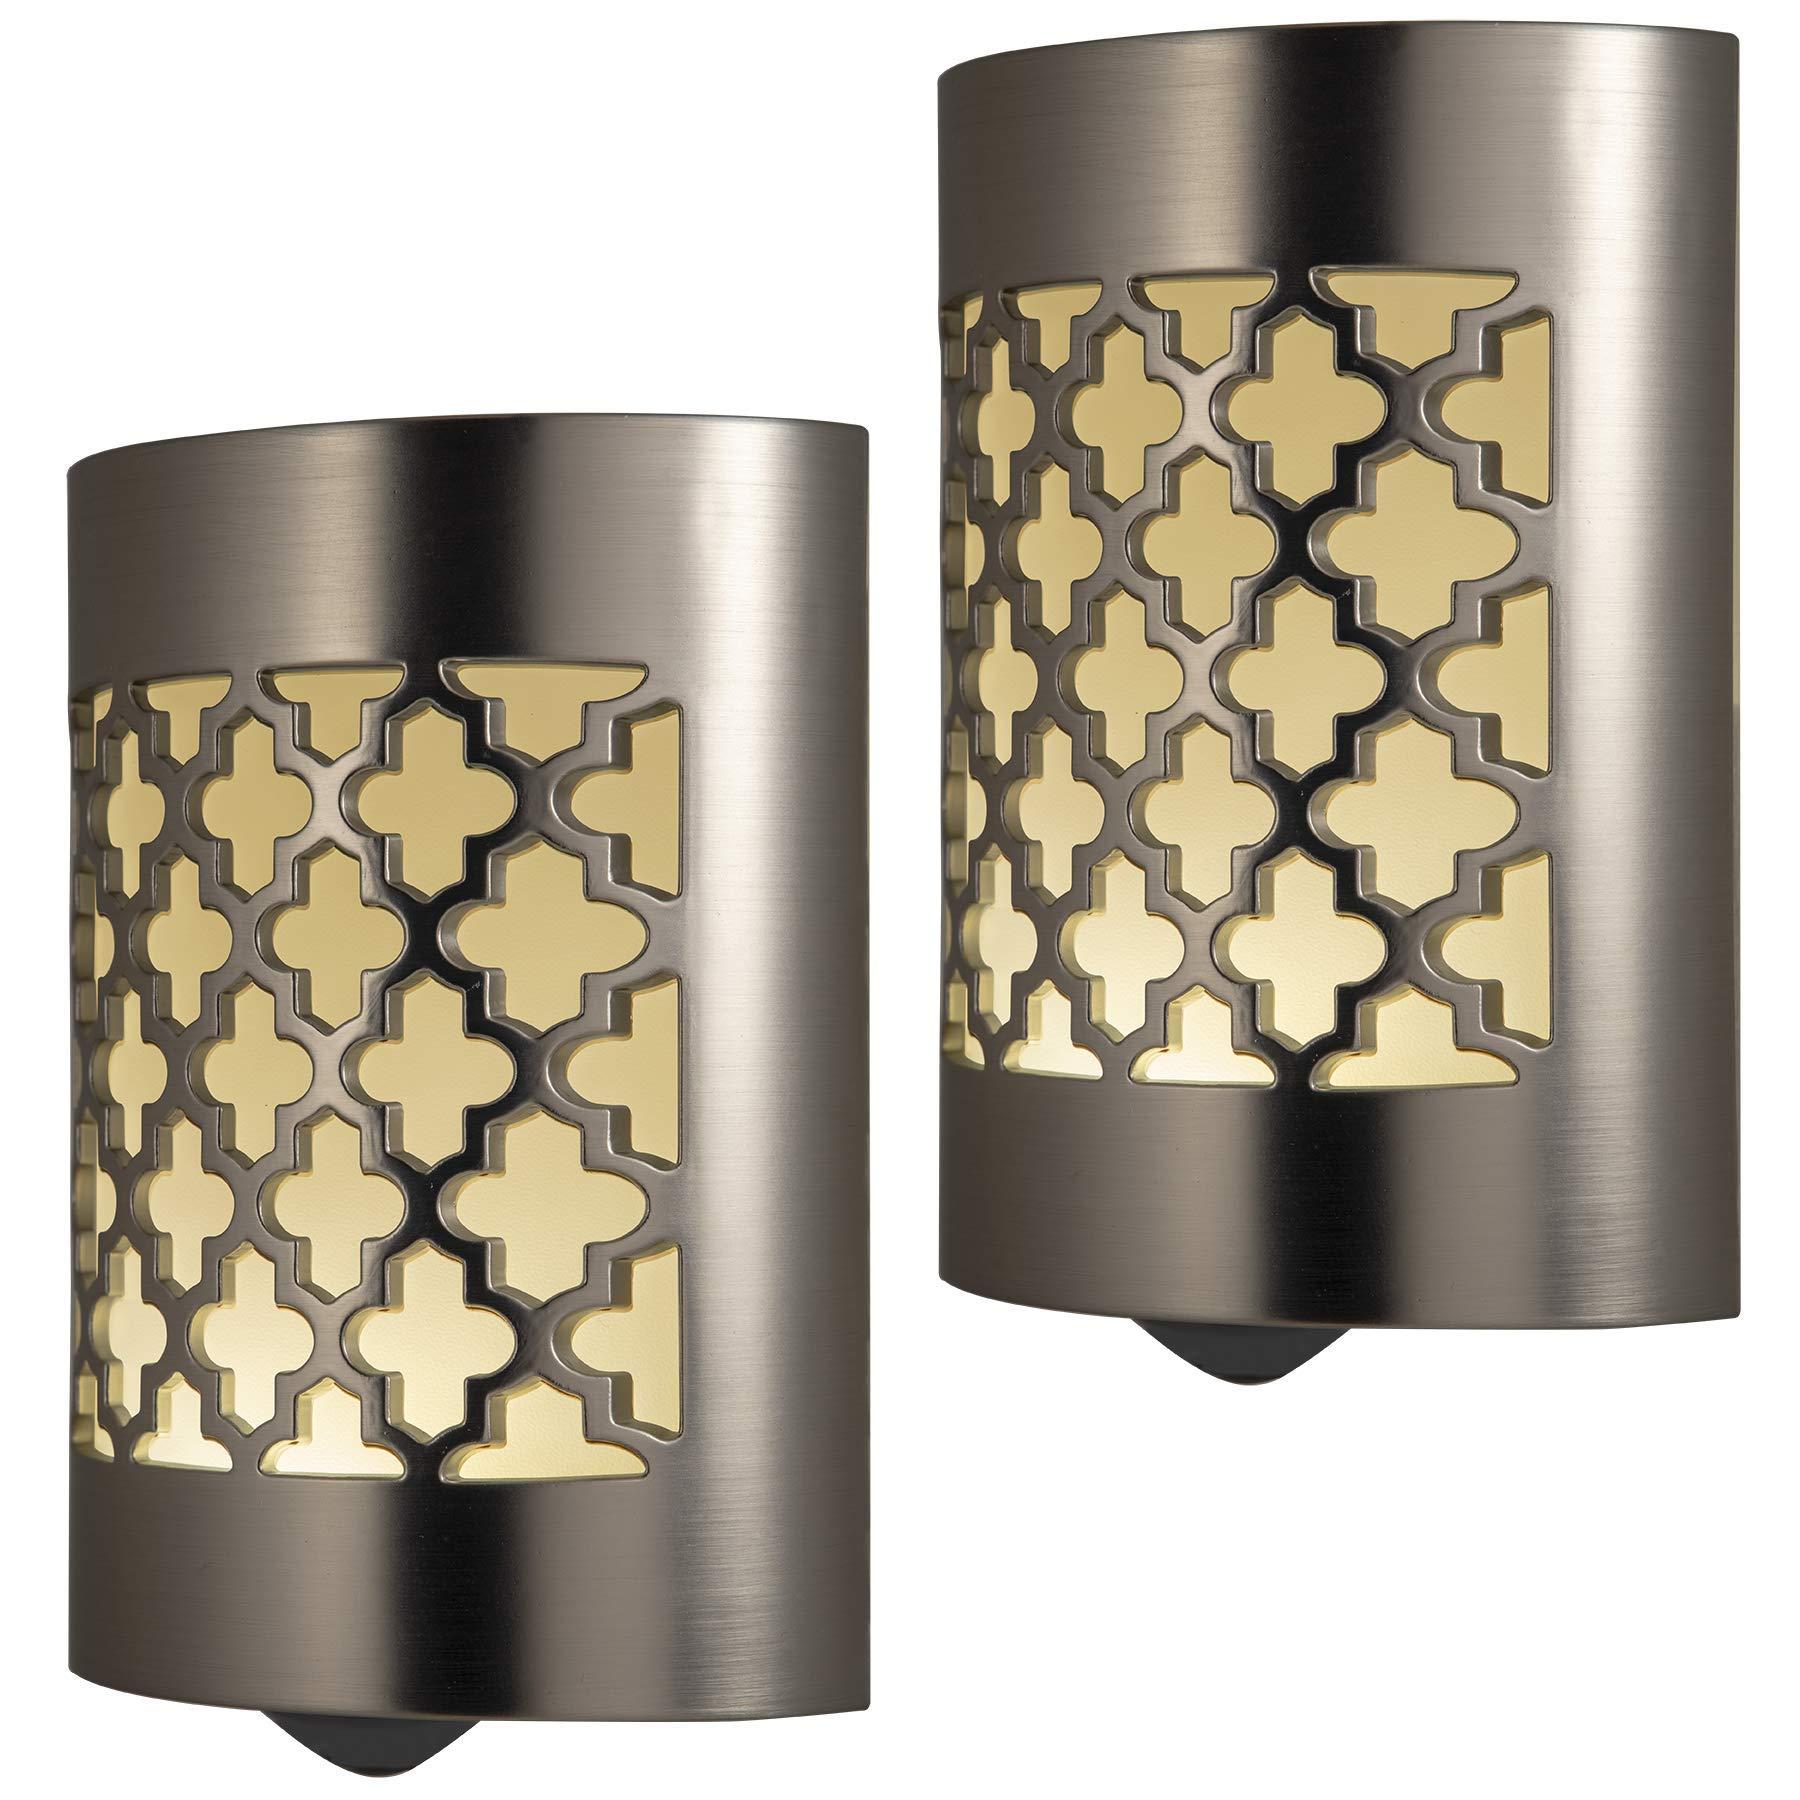 GE CoverLite LED Night Light Design, 2 Pack, Plug-in, Dusk-to-Dawn Sensor, Home Decor, for Elderly, Ideal for Kitchen, Bathroom, Bedroom, Office, Nursery, Hallway, 46815, Brushed Nickel | Moroccan, 2 by GE